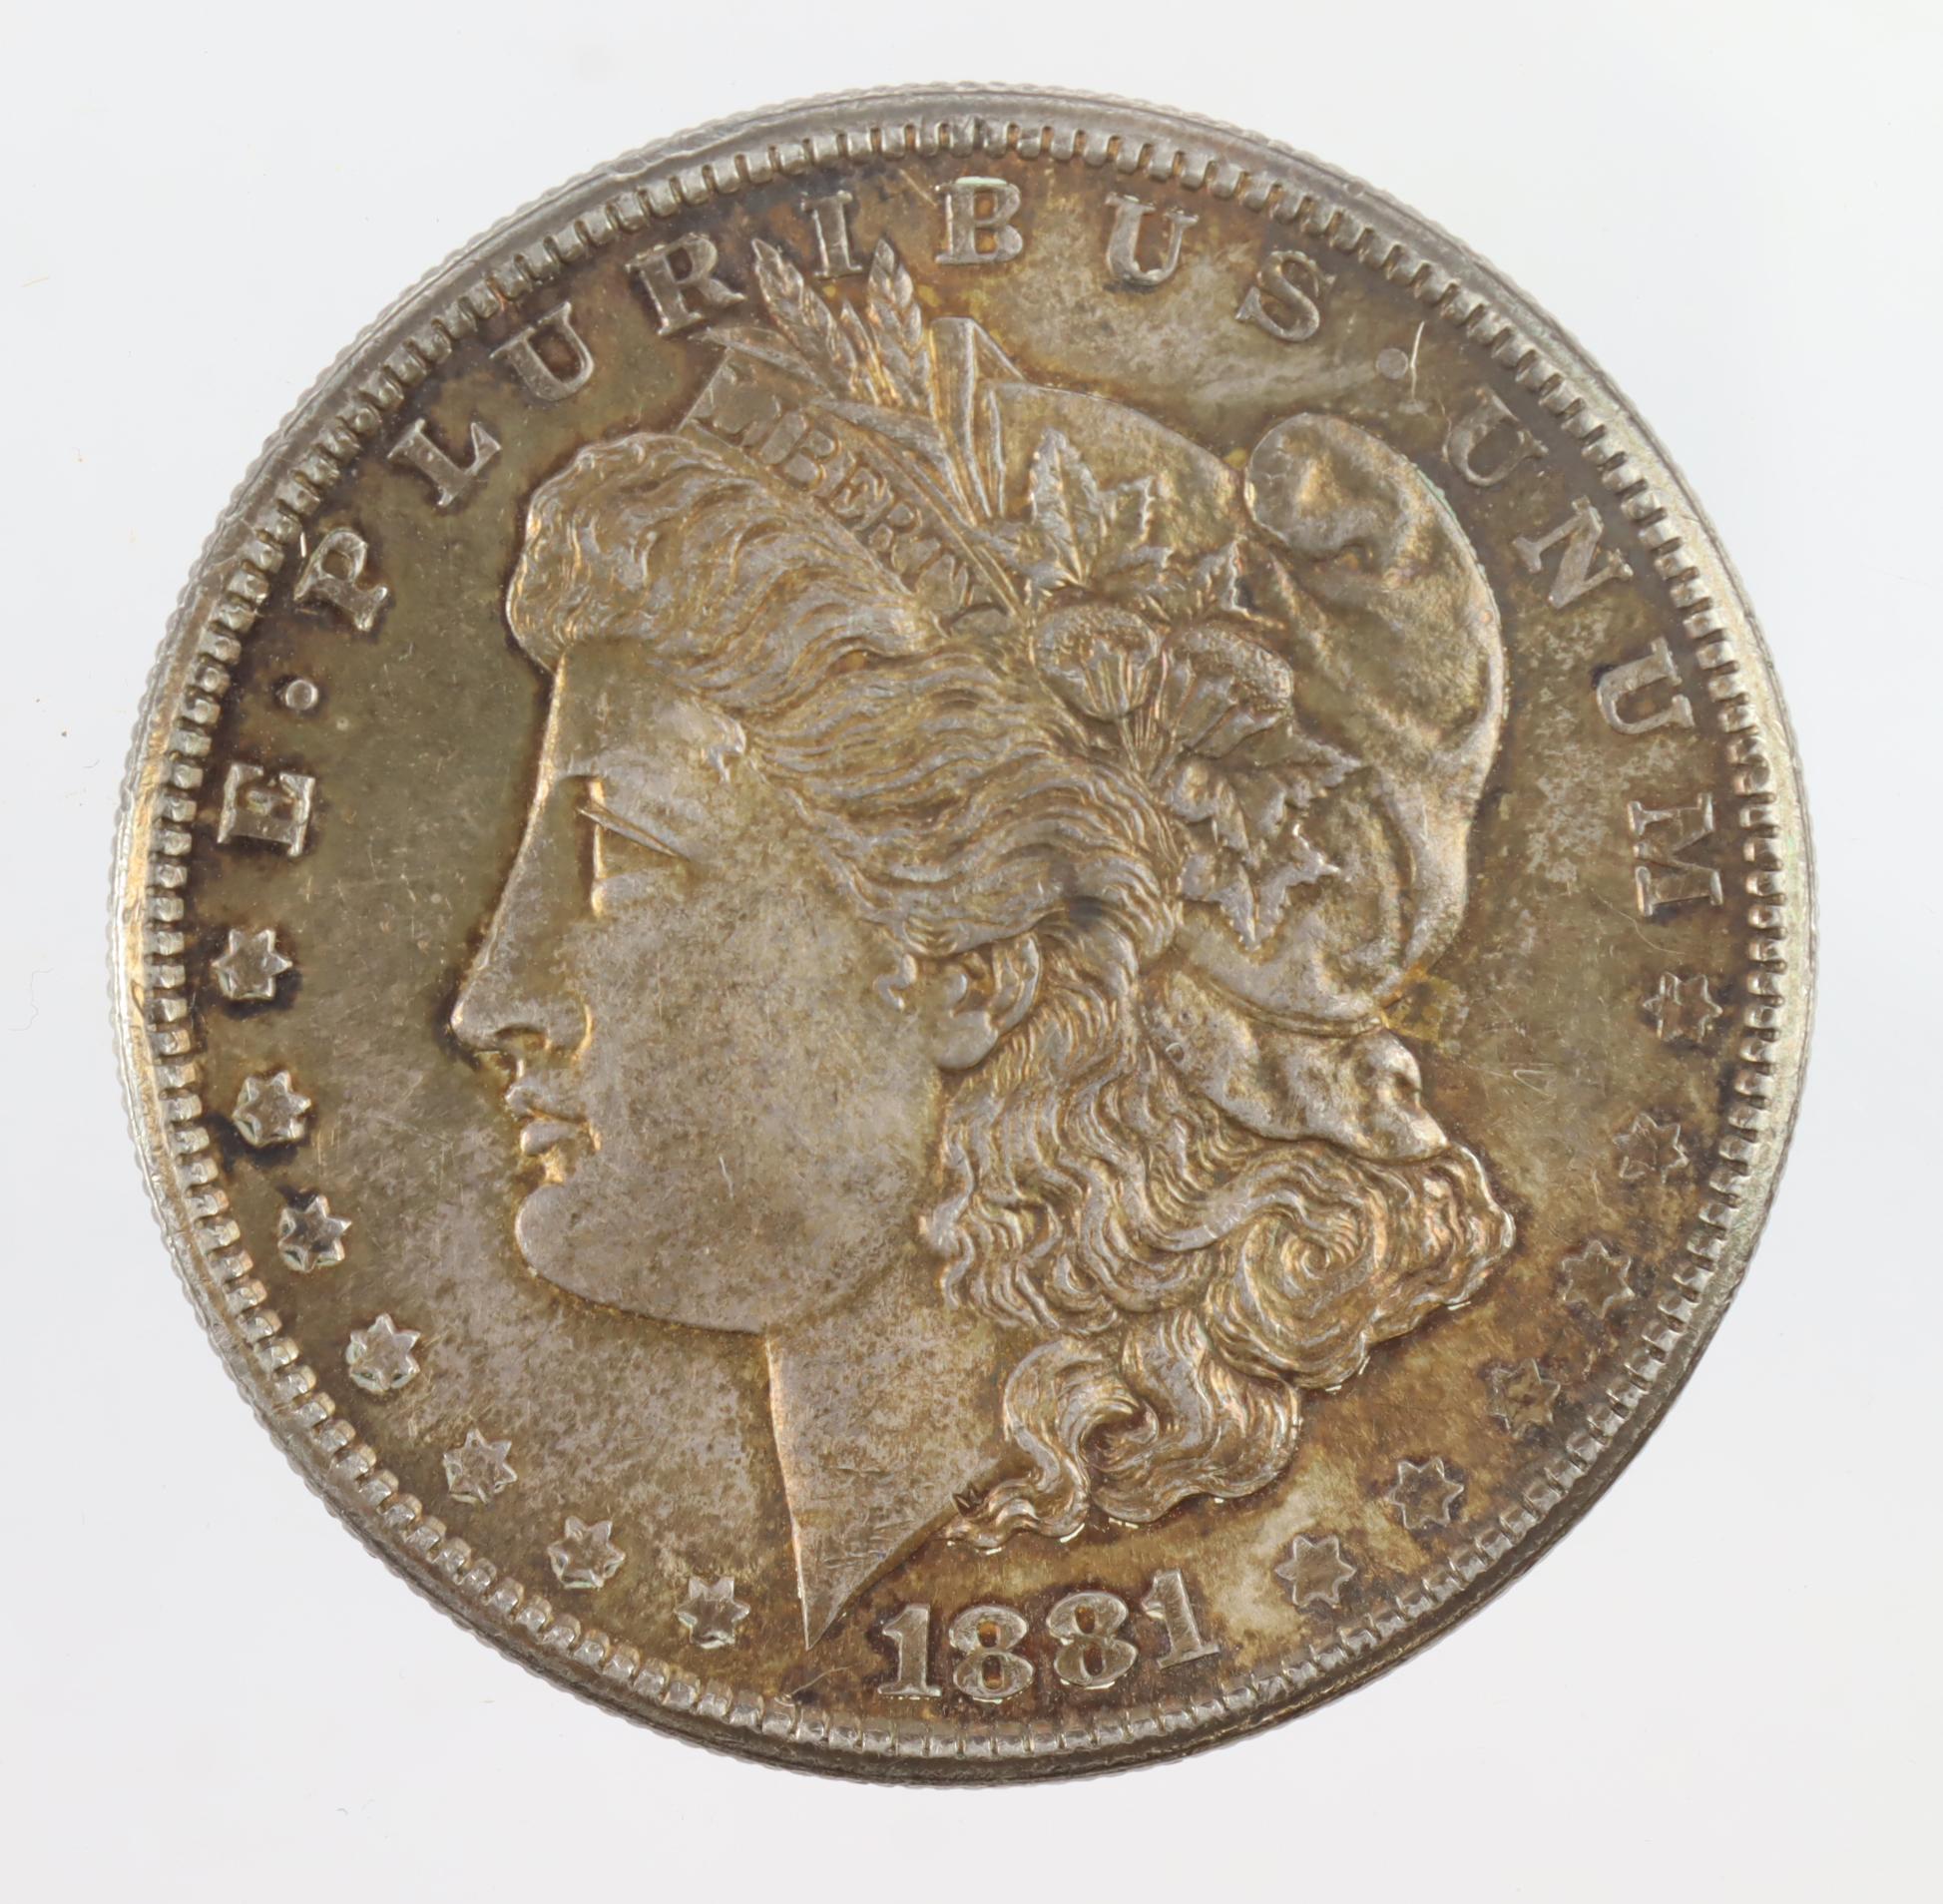 USA Morgan Silver Dollar 1881S, toned UNC, small scratch.